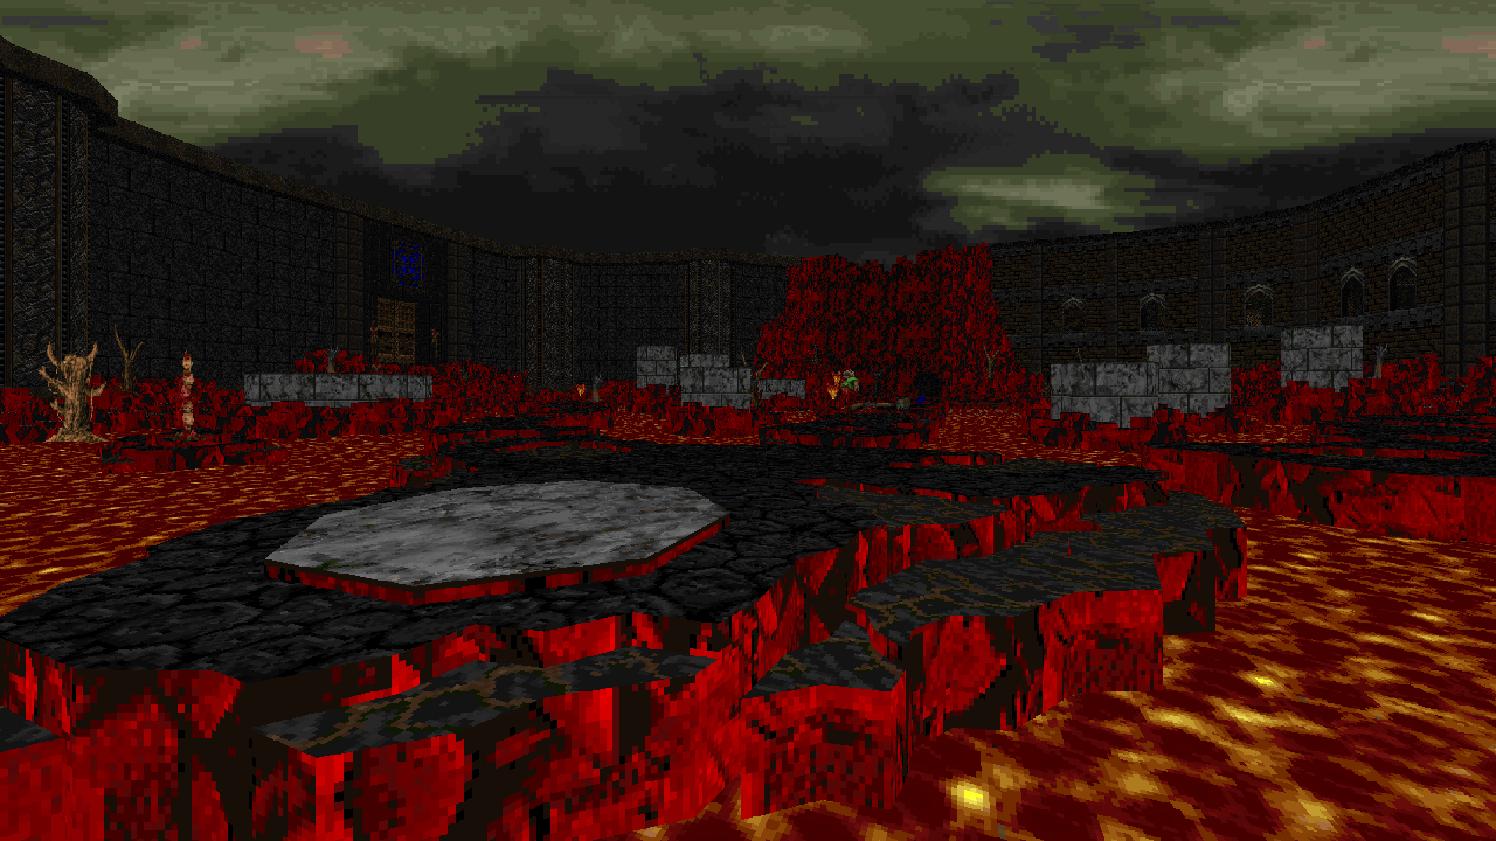 Screenshot_Doom_20190919_020754.png.cda9053a268ad78ba06de9c2f868f3d9.png